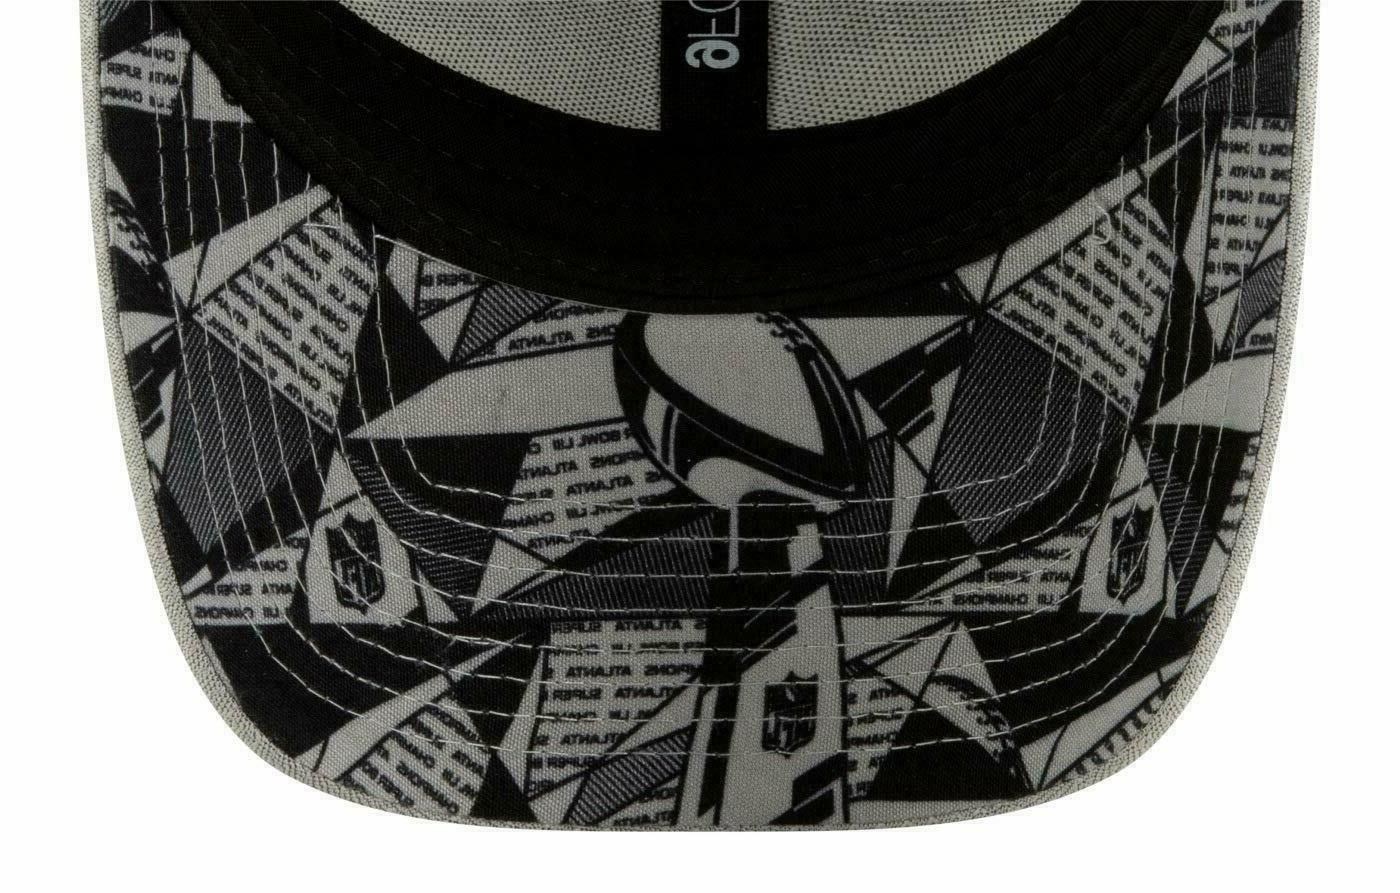 New England Super 53 Champs Locker Room Era Hat